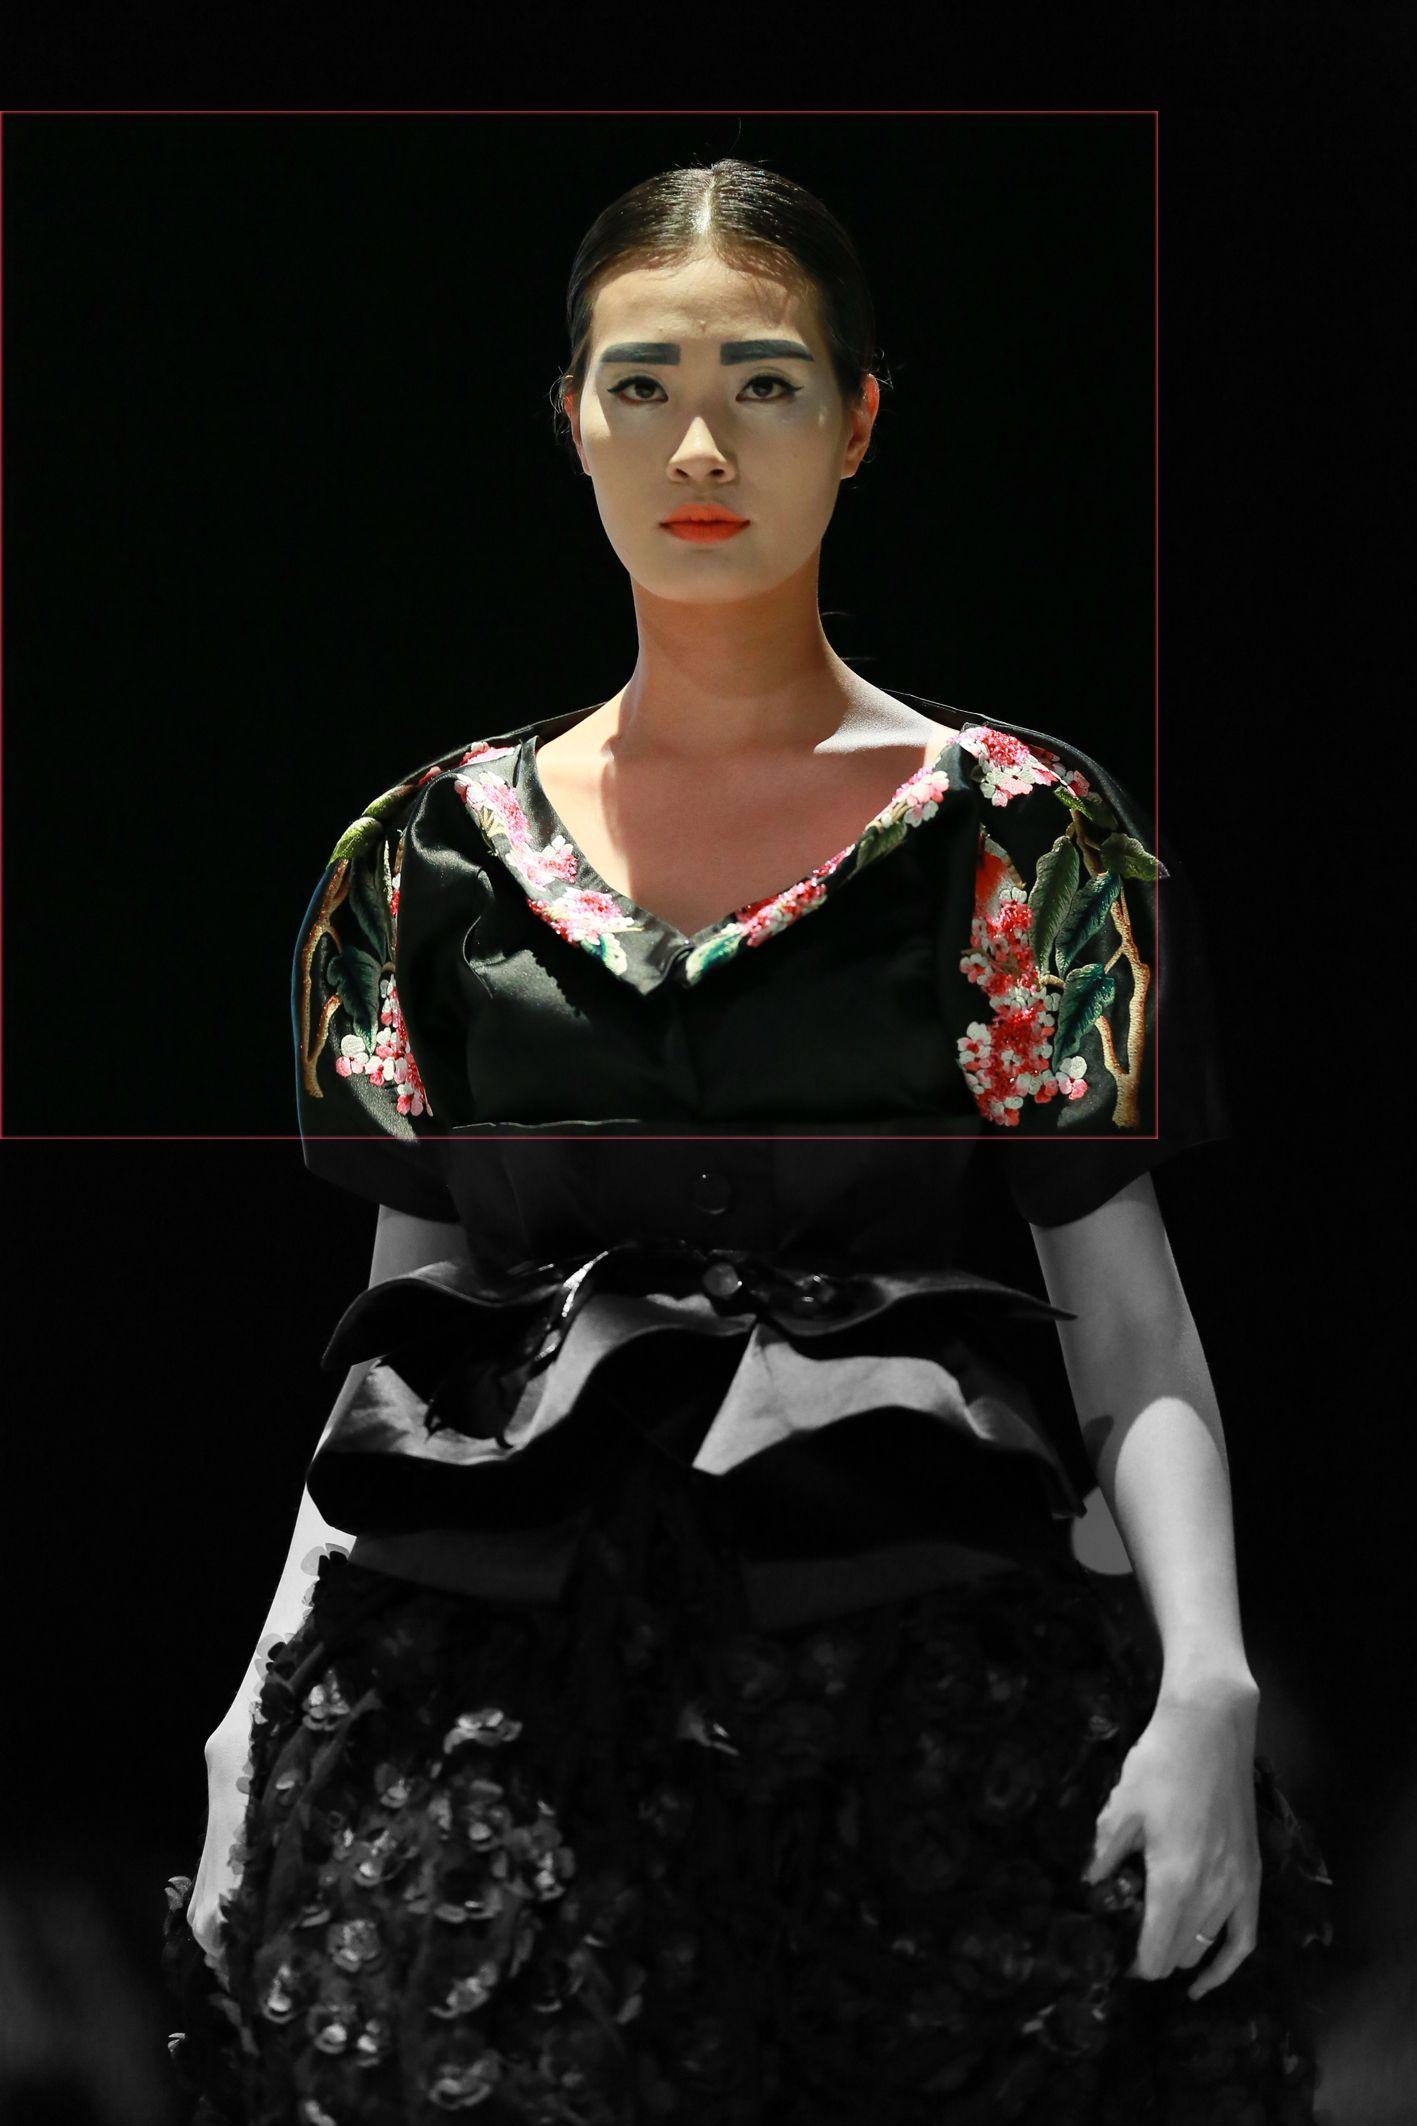 Vietnam Fashion Week FW14 - Haute Couture. Designer: Charming Lys Photo: Thanh Dat